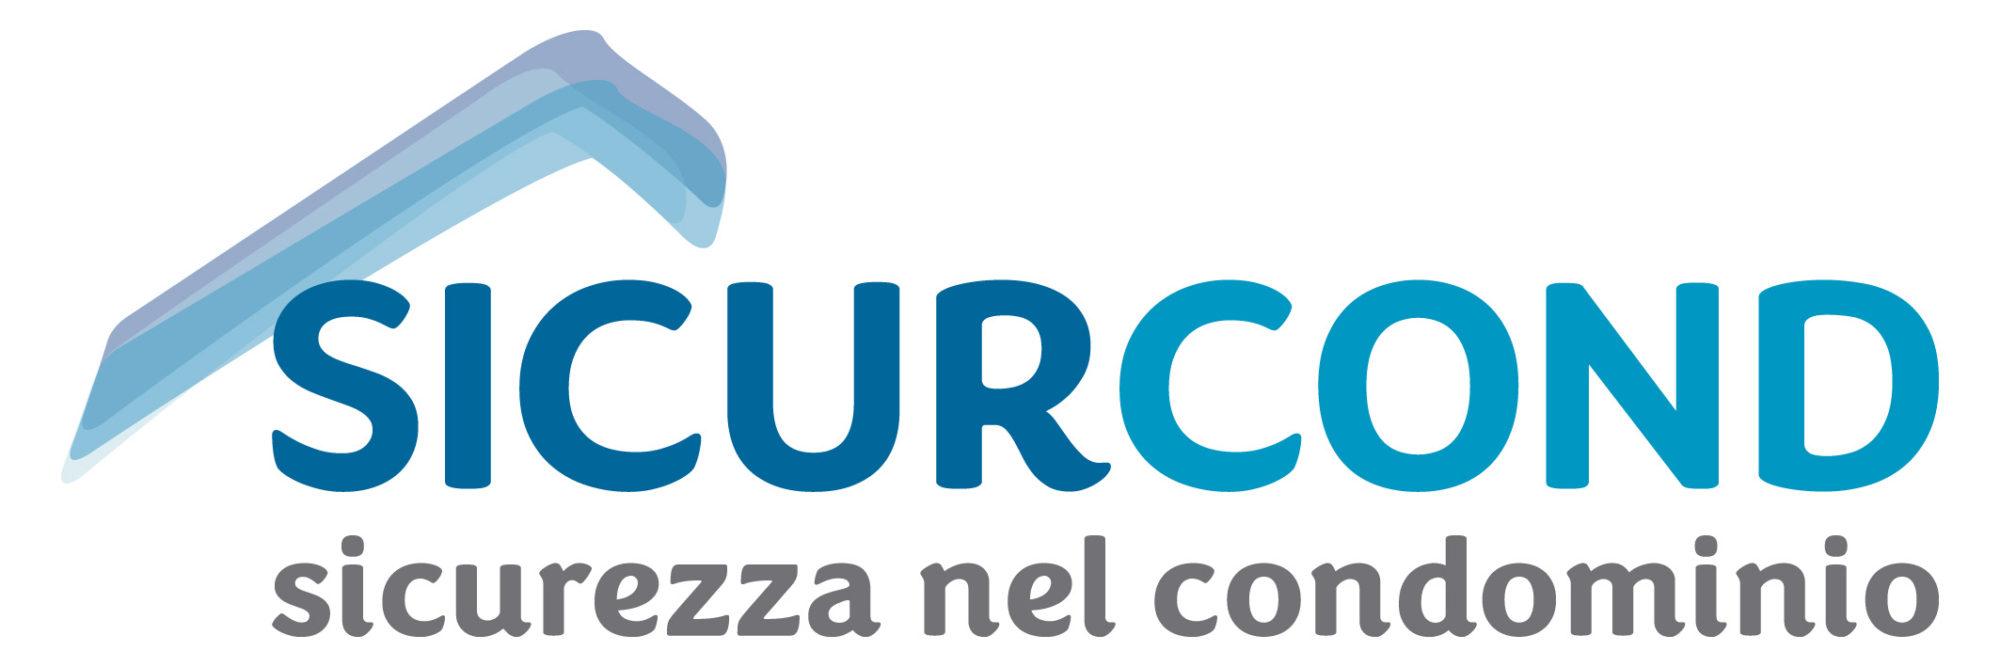 Sicurcond